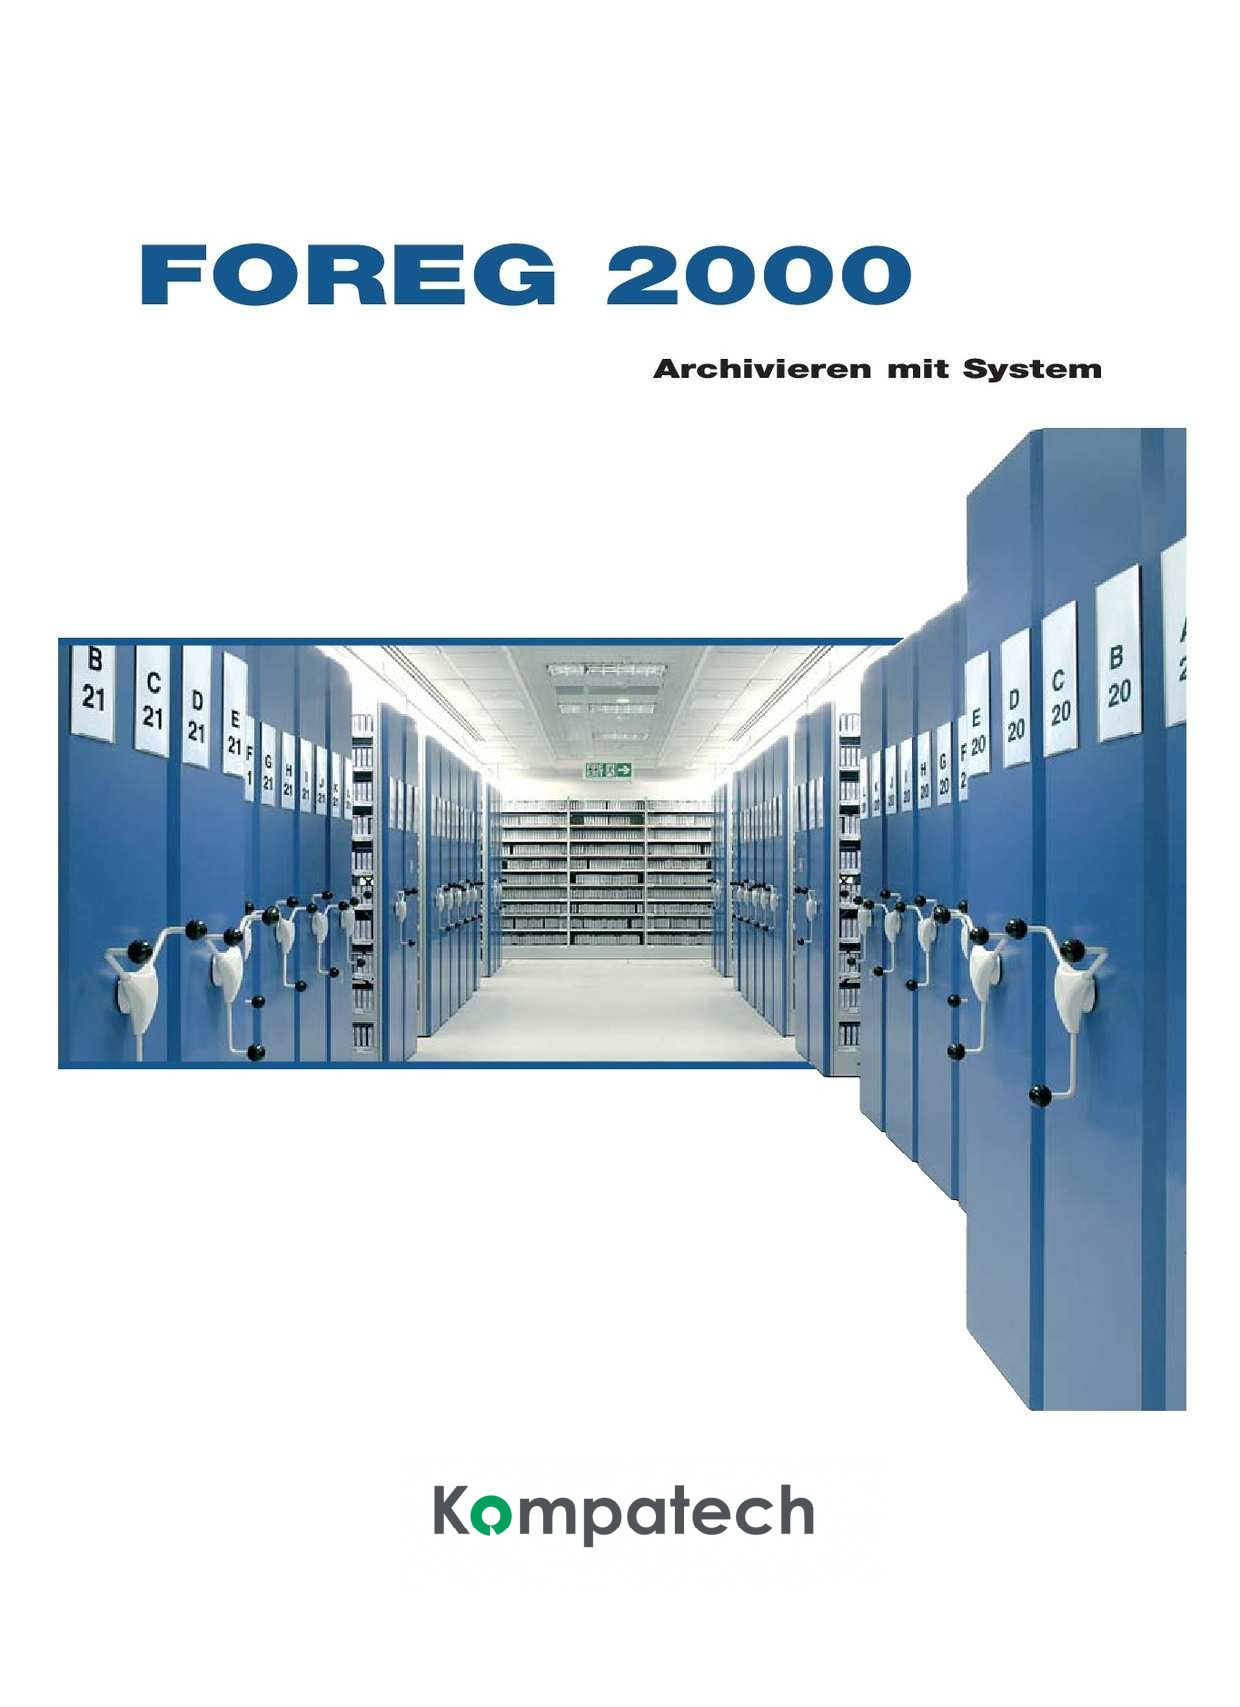 Archiv Rollregal Katalog Foreq 2000